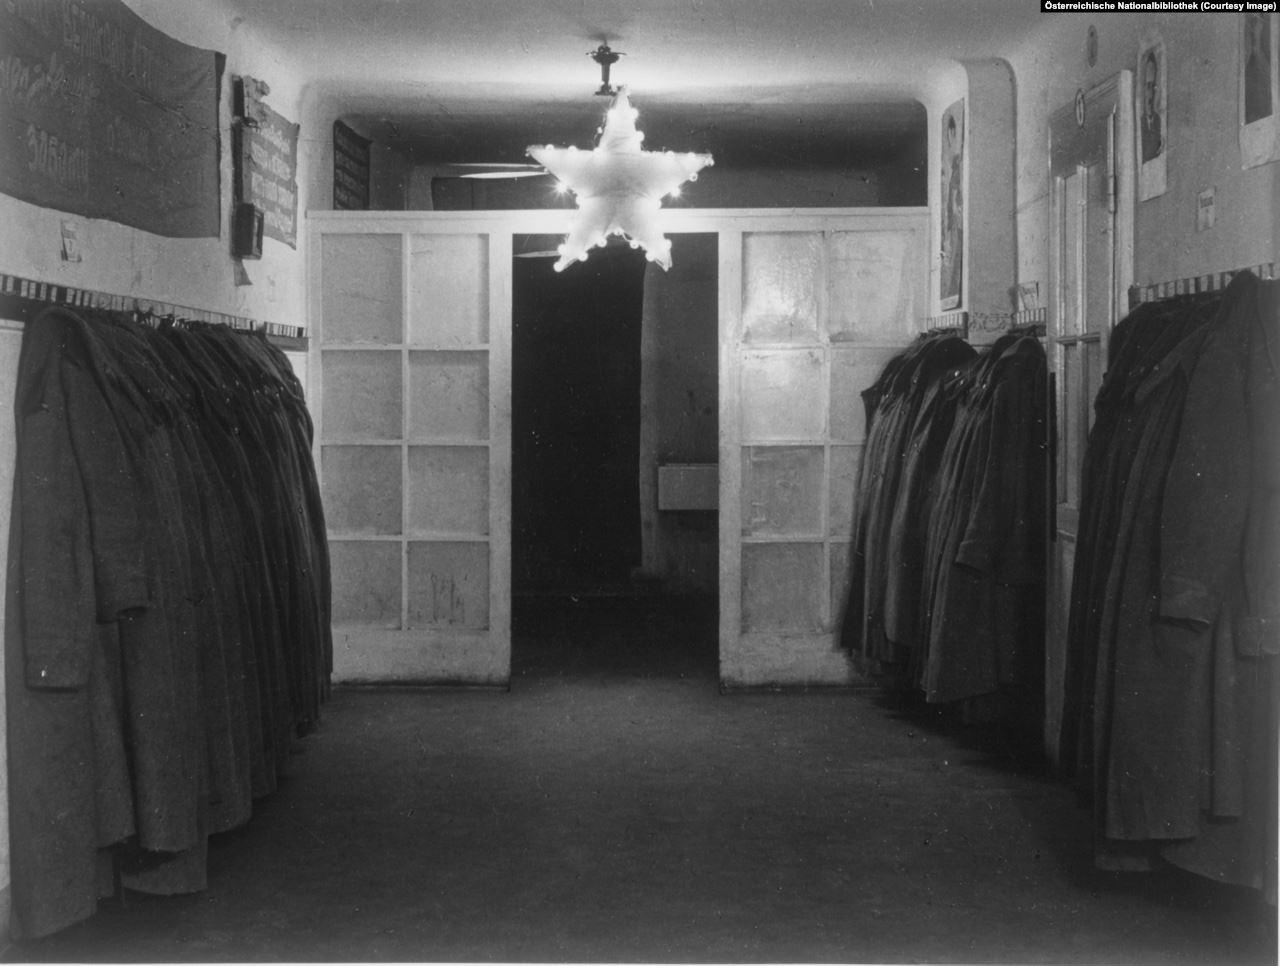 The wardrobe room of the soviet army commanders